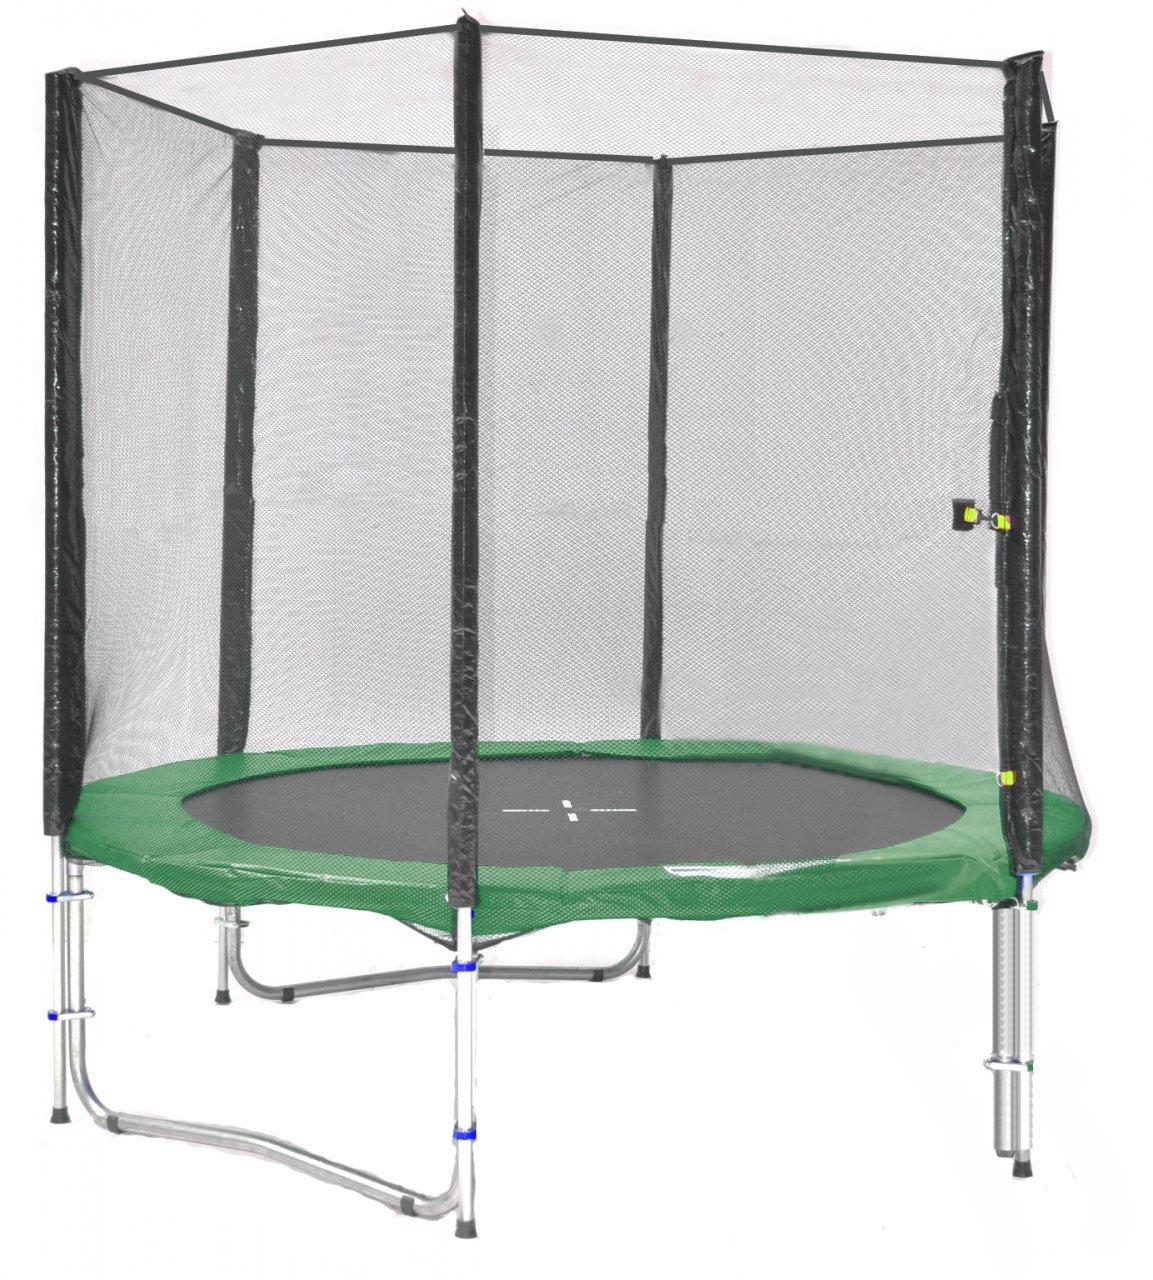 SB-185-G Professionell Gartentrampolin 185cm incl. Netz, Leiter 90kg Traglast